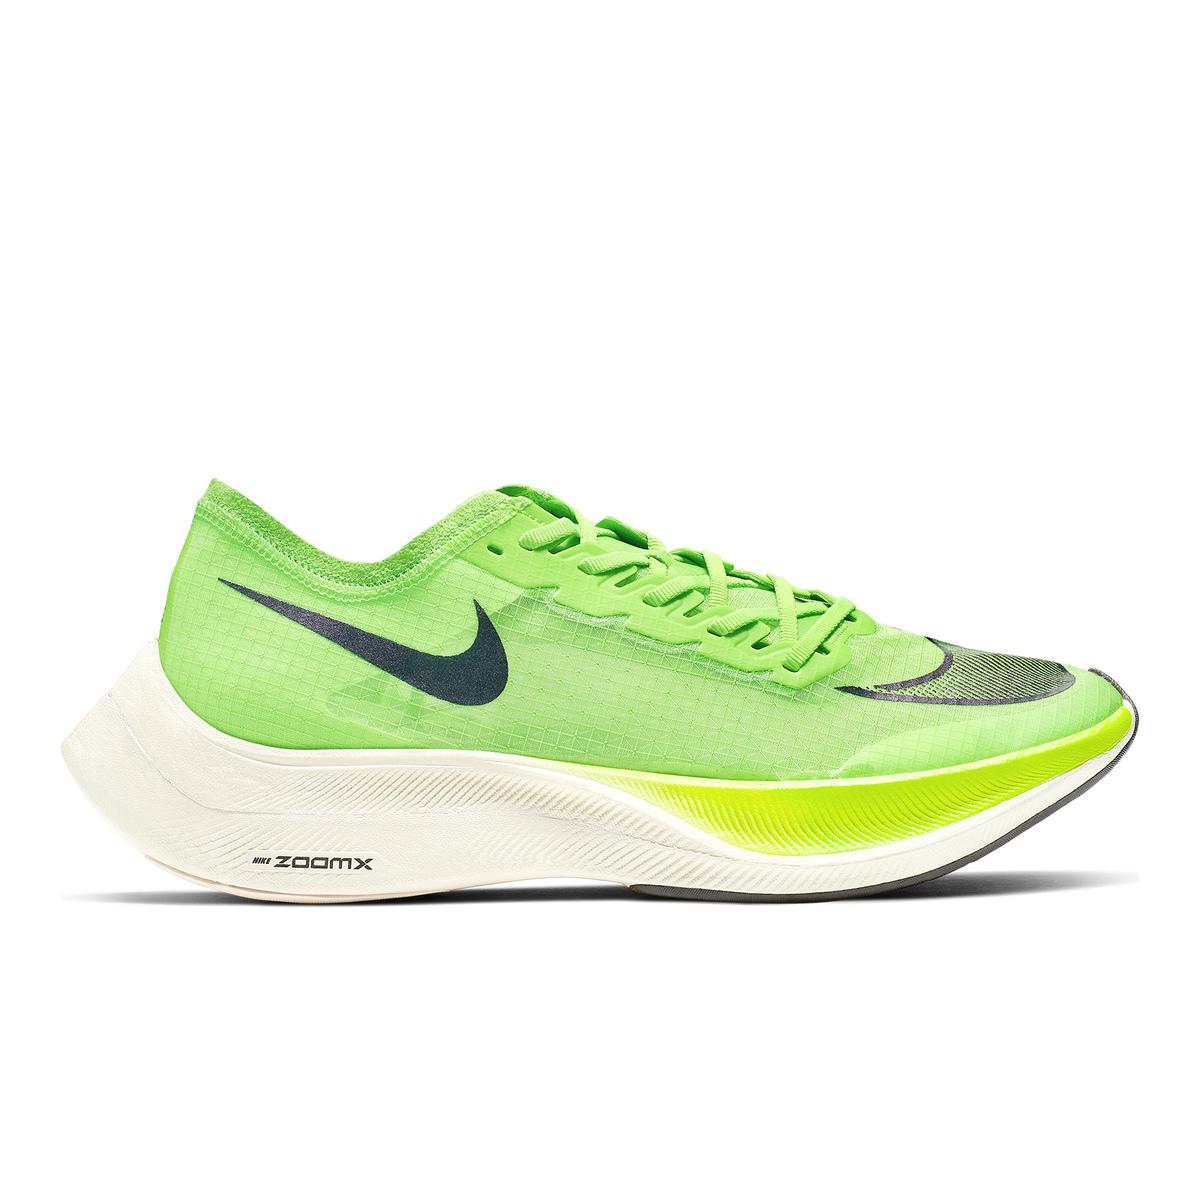 2nike scarpe corsa uomo